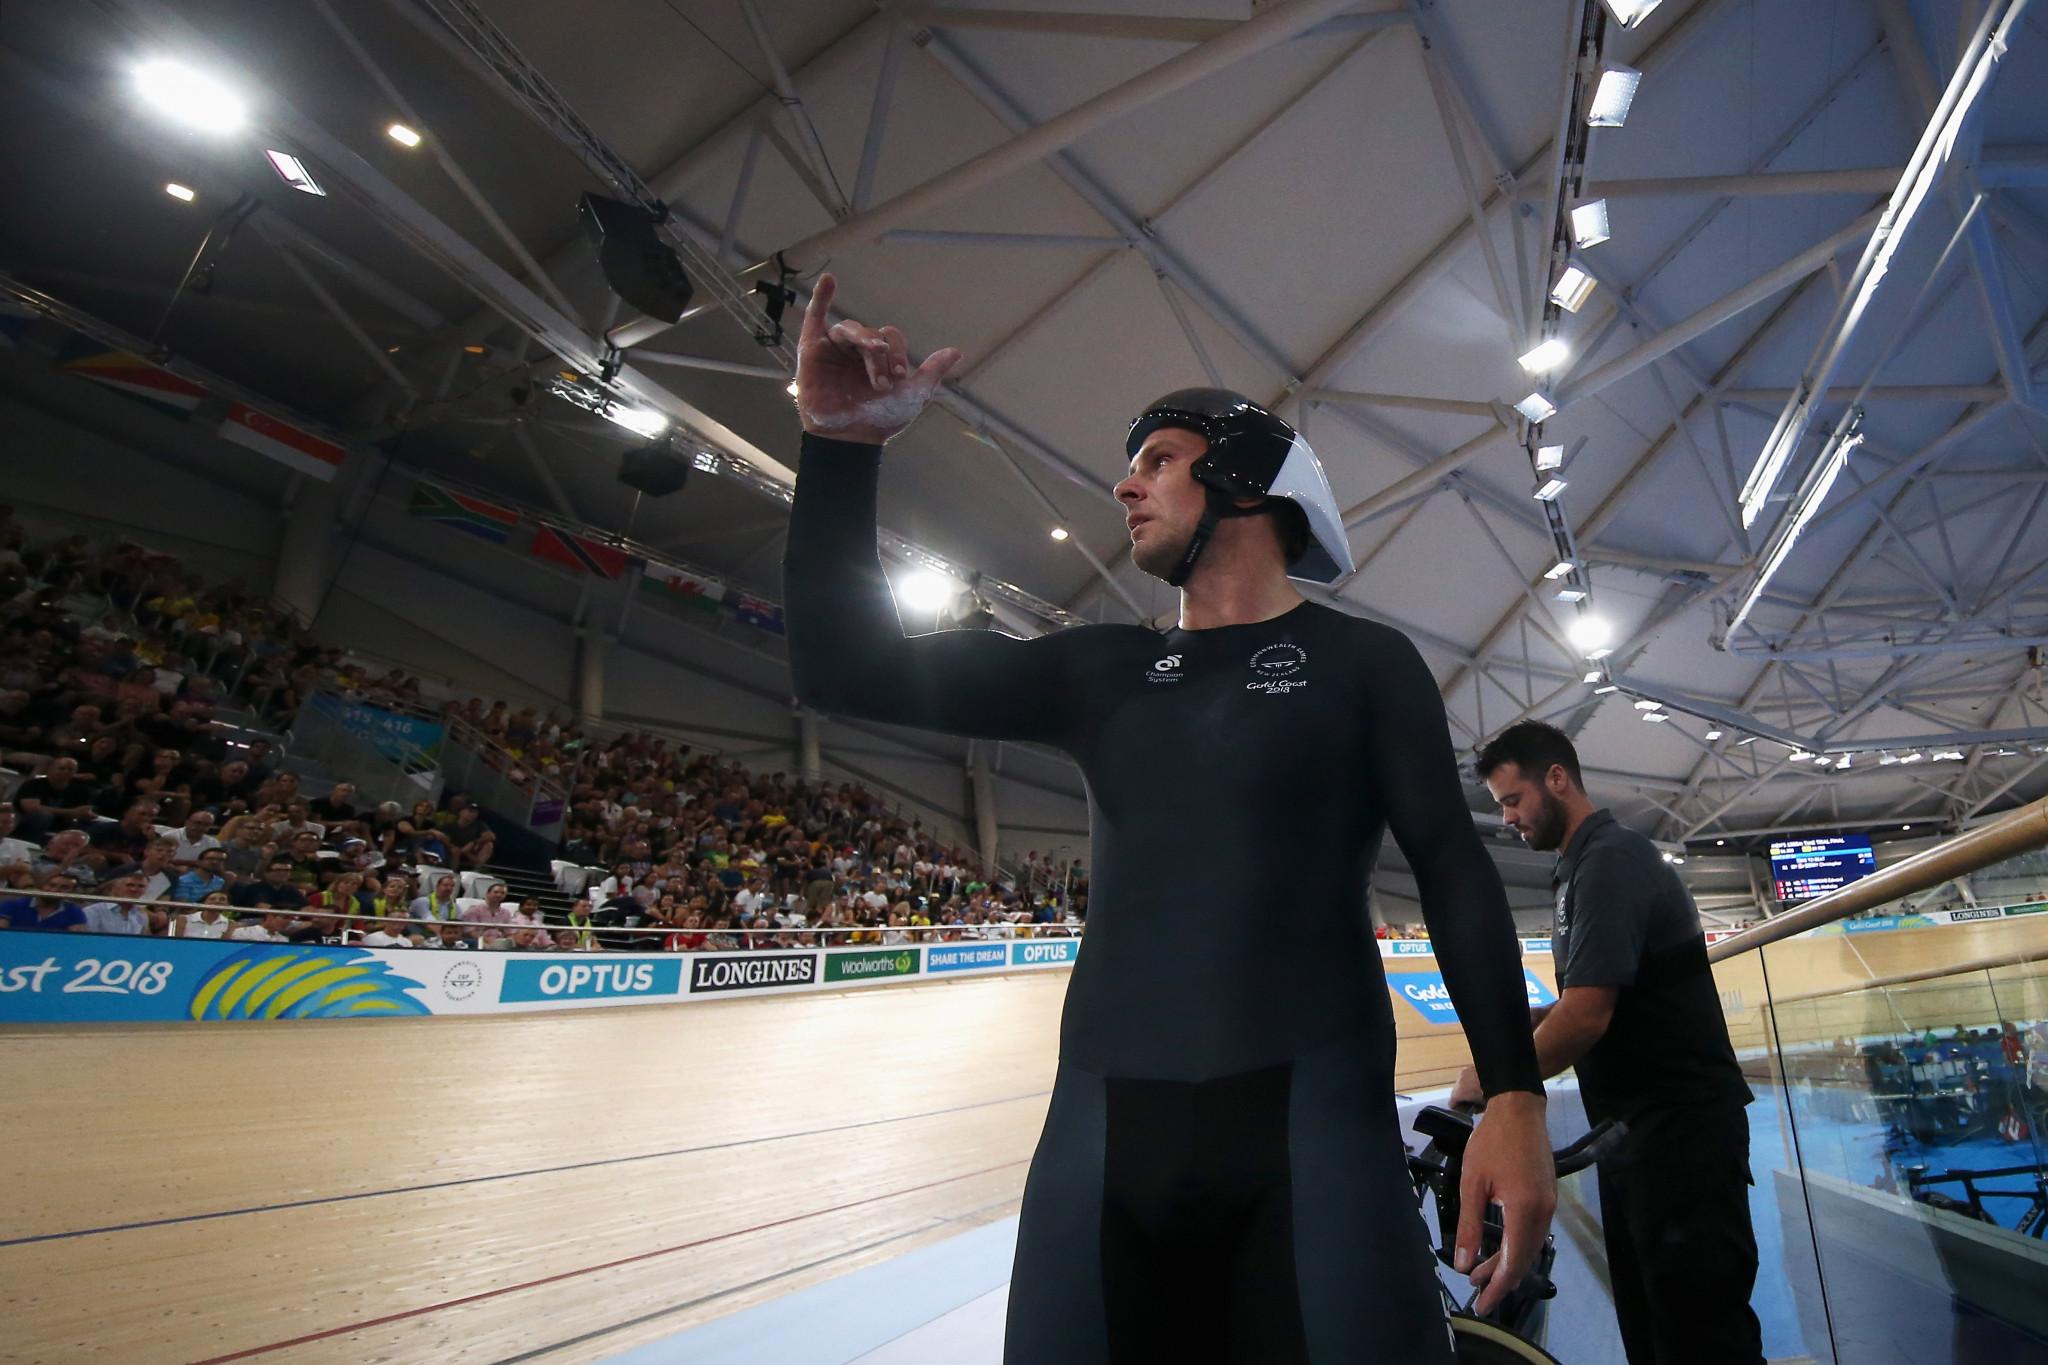 New Zealand sprint star Dawkins retires following Tokyo 2020 postponement